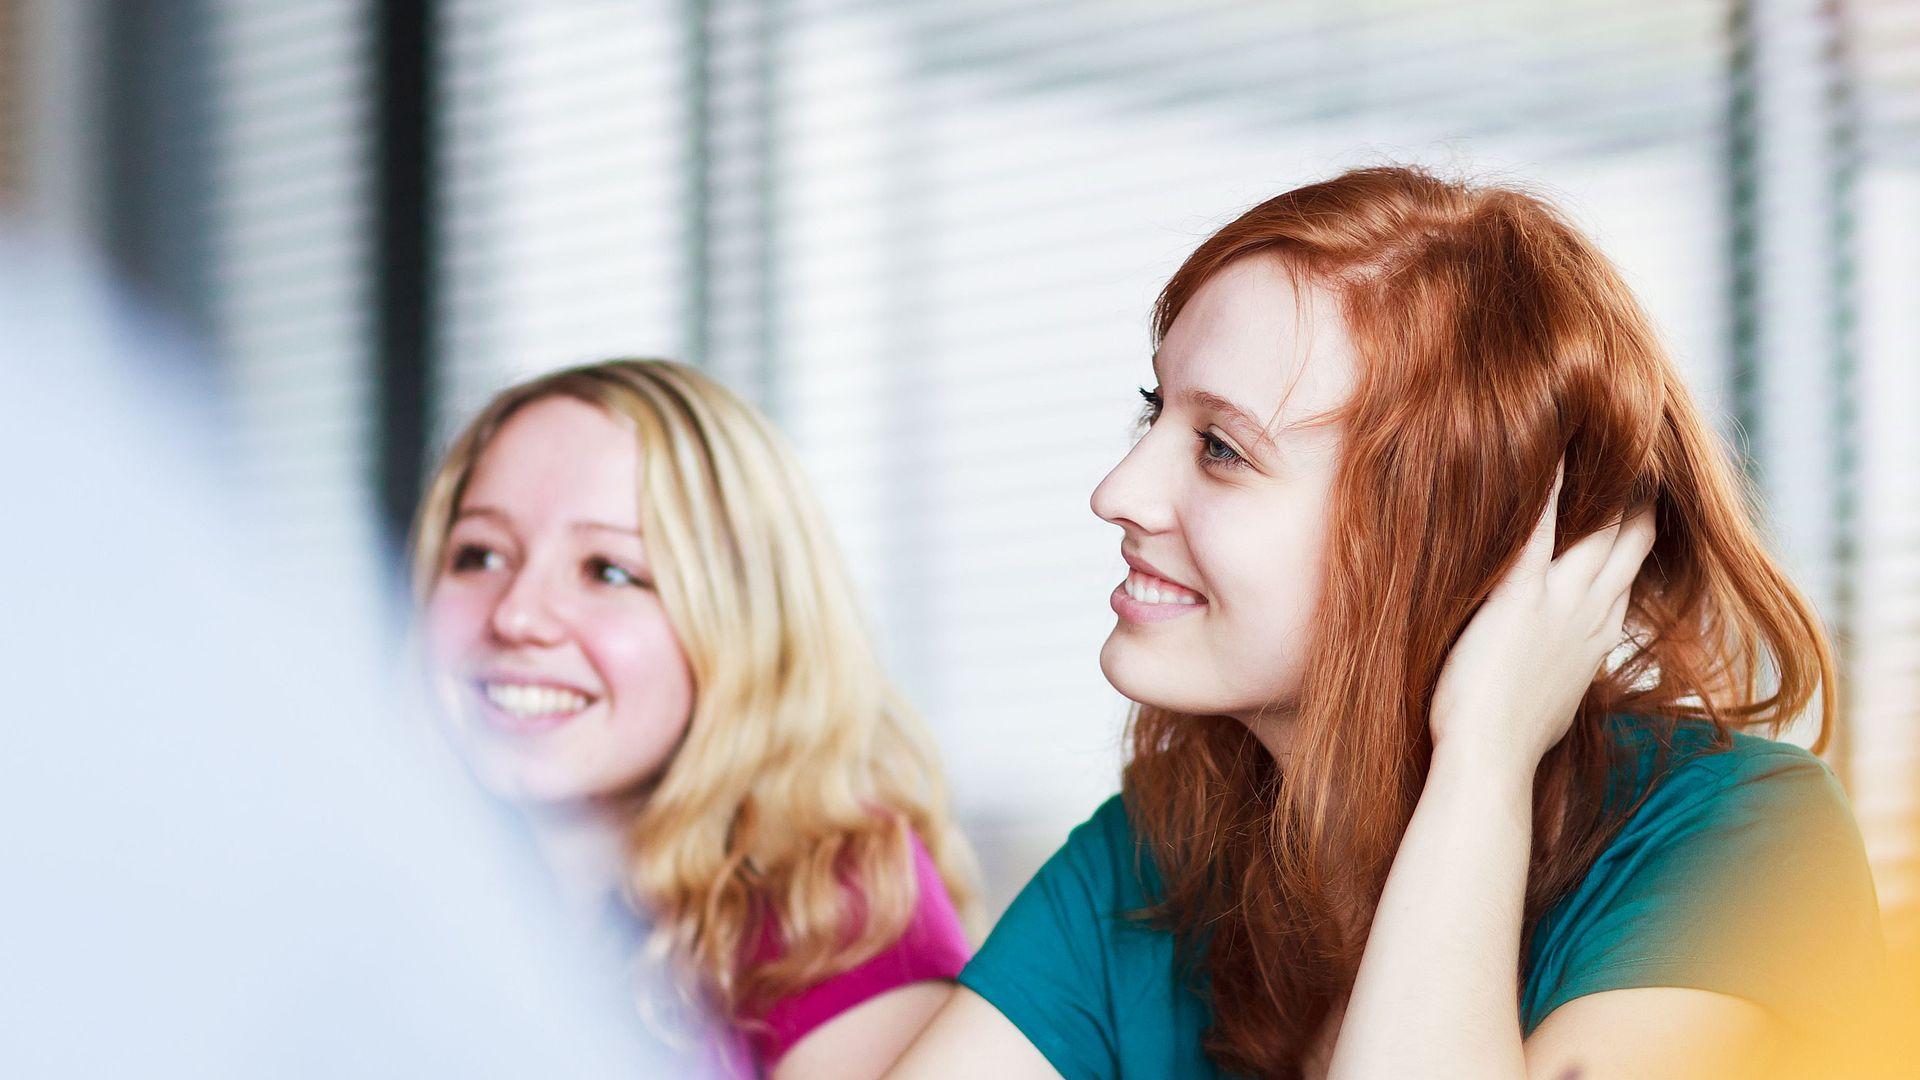 Finde Deinen Studiengang Studieren In Freiberg Tu